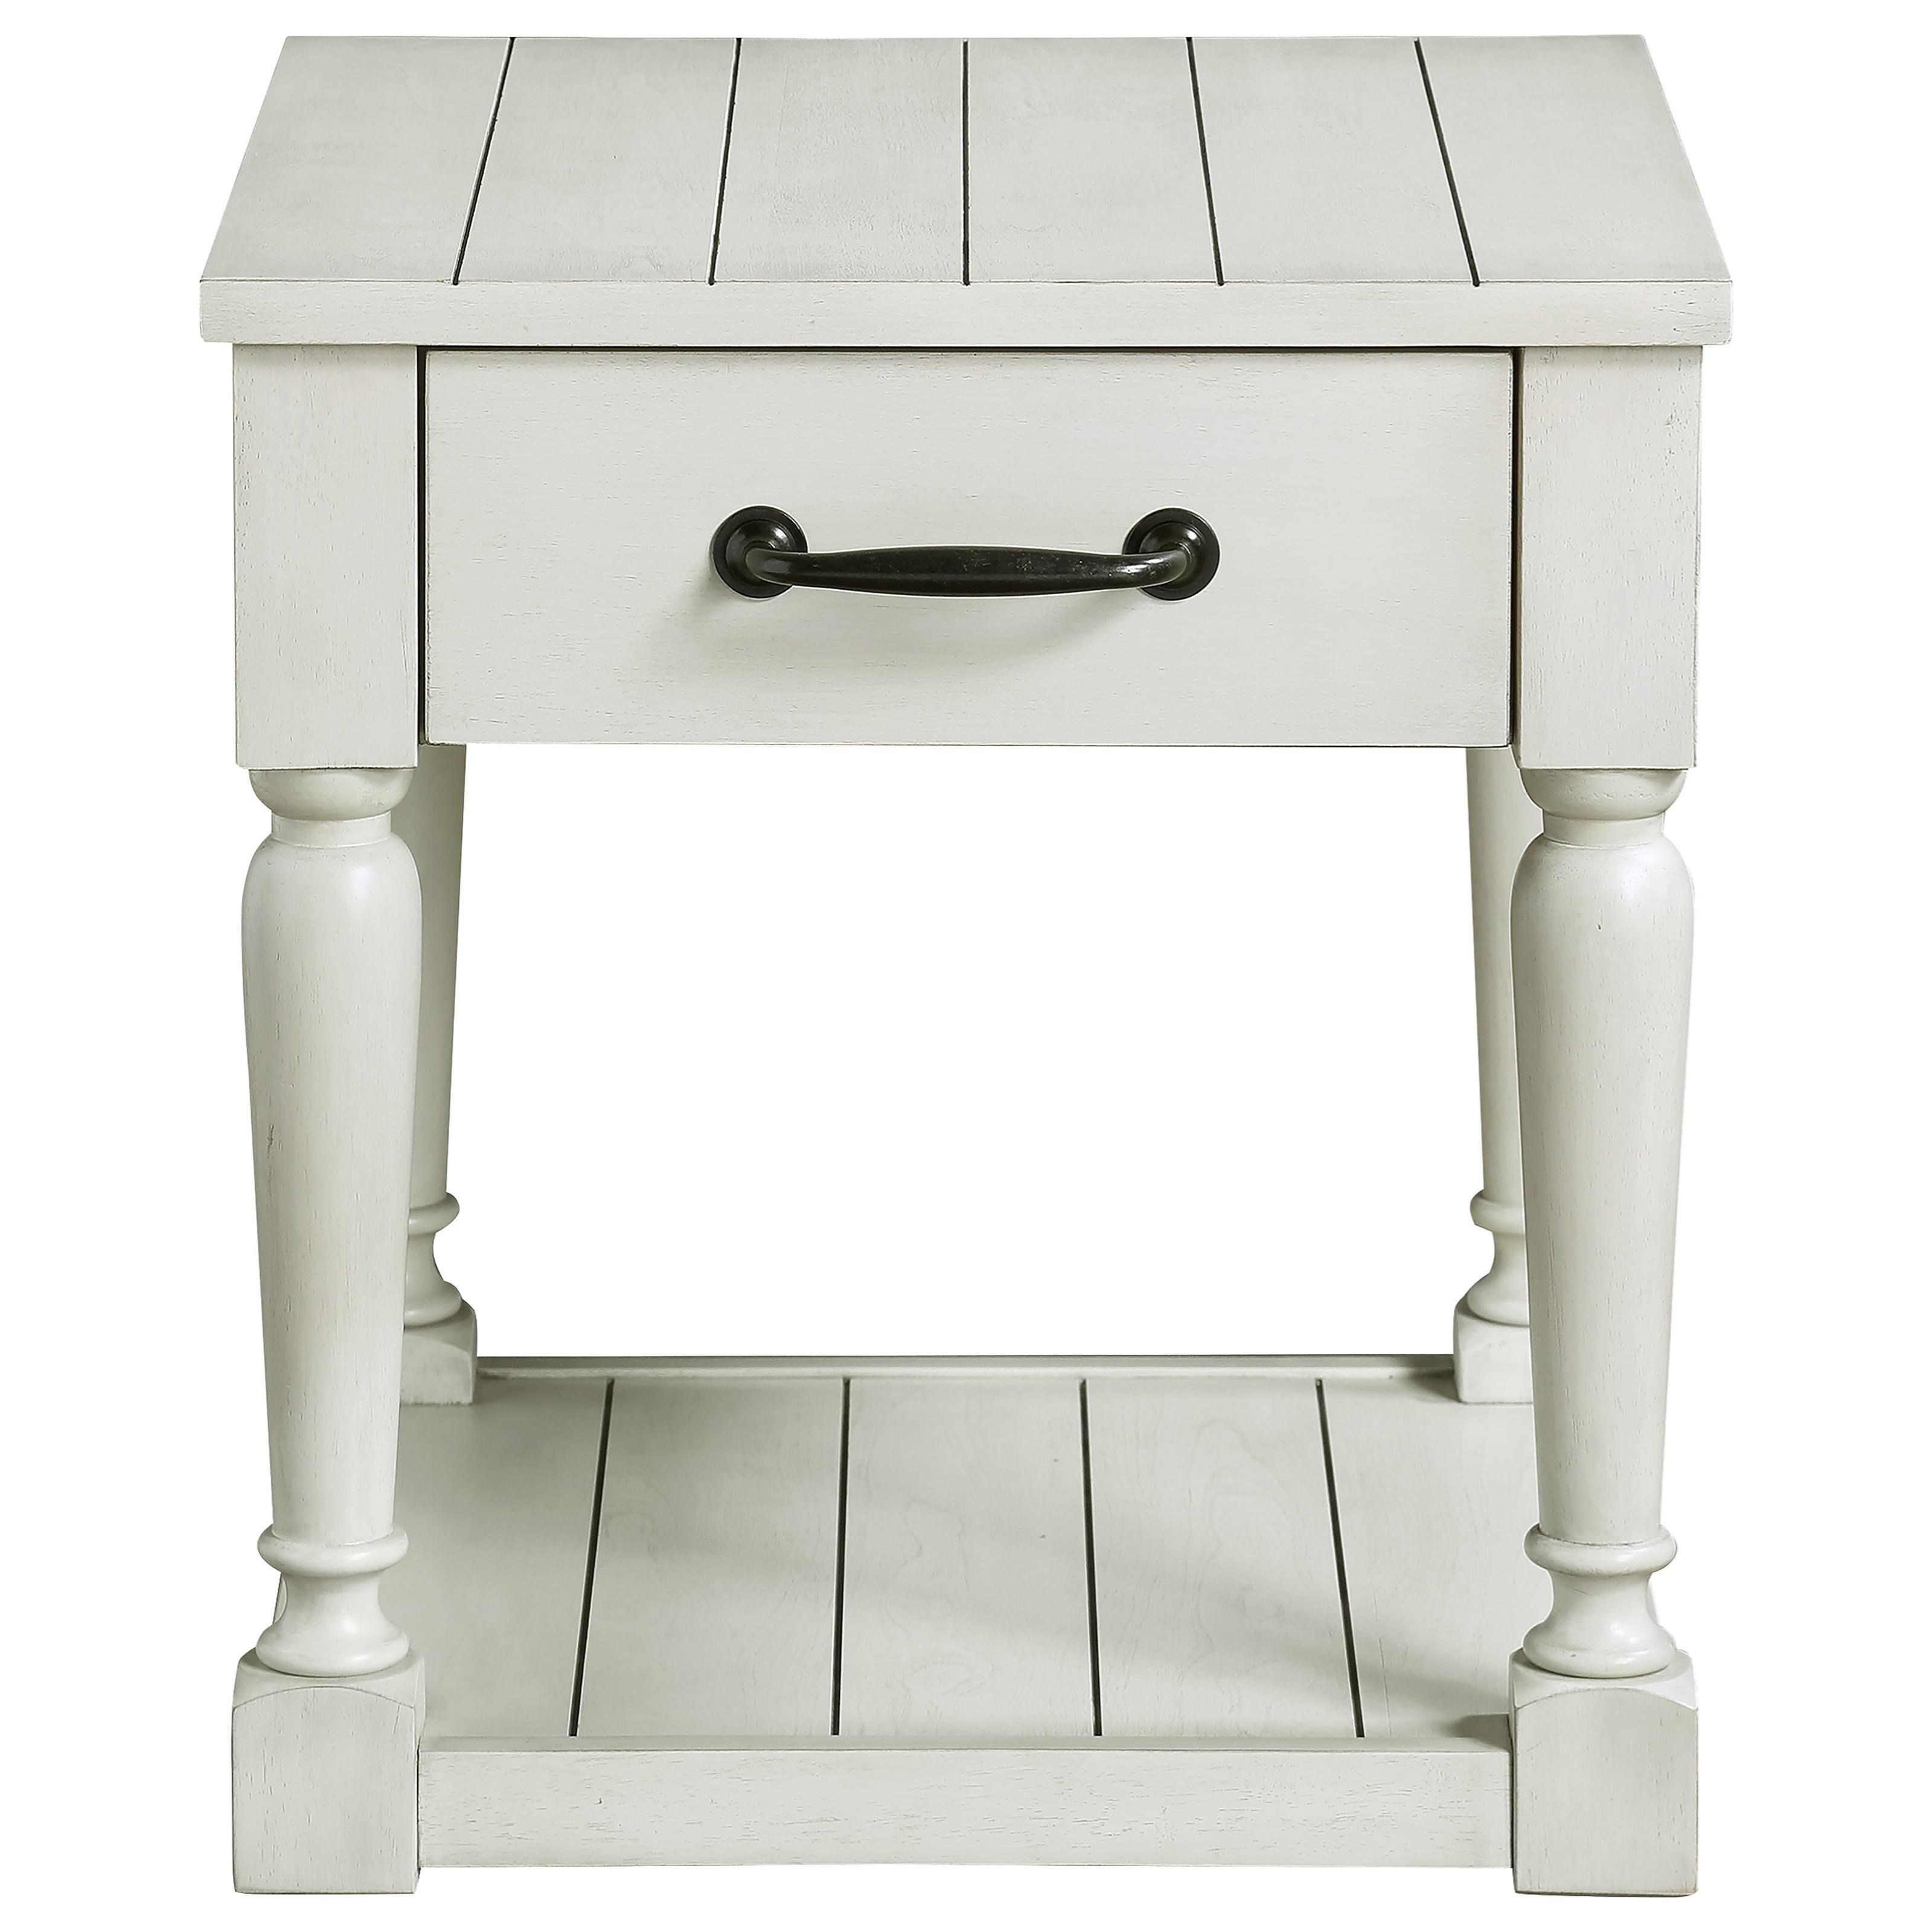 Hemingway End Table by Steve Silver at Walker's Furniture